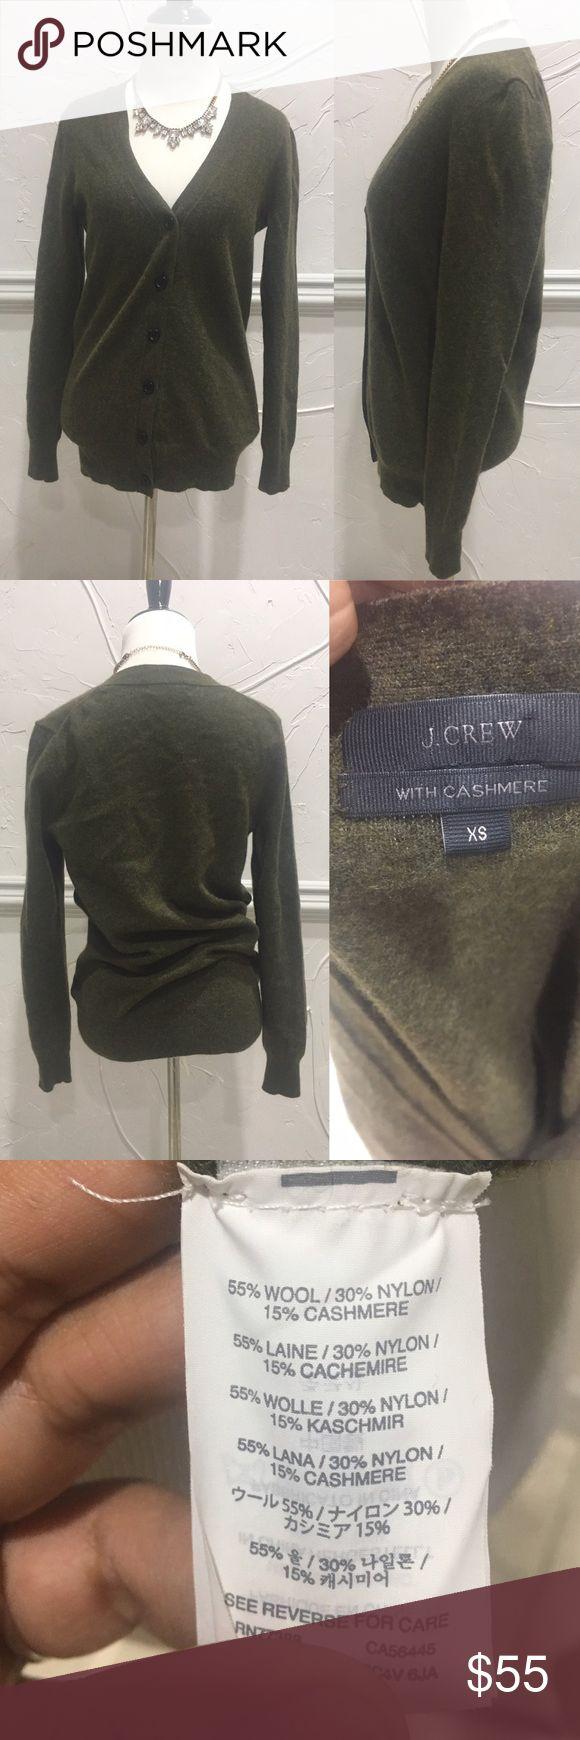 J. Crew Cashmere Wool V Neck Cardigan Size XS J. Crew Cashmere Wool V Neck Cardigan Size XS. Like new J. Crew Sweaters Cardigans